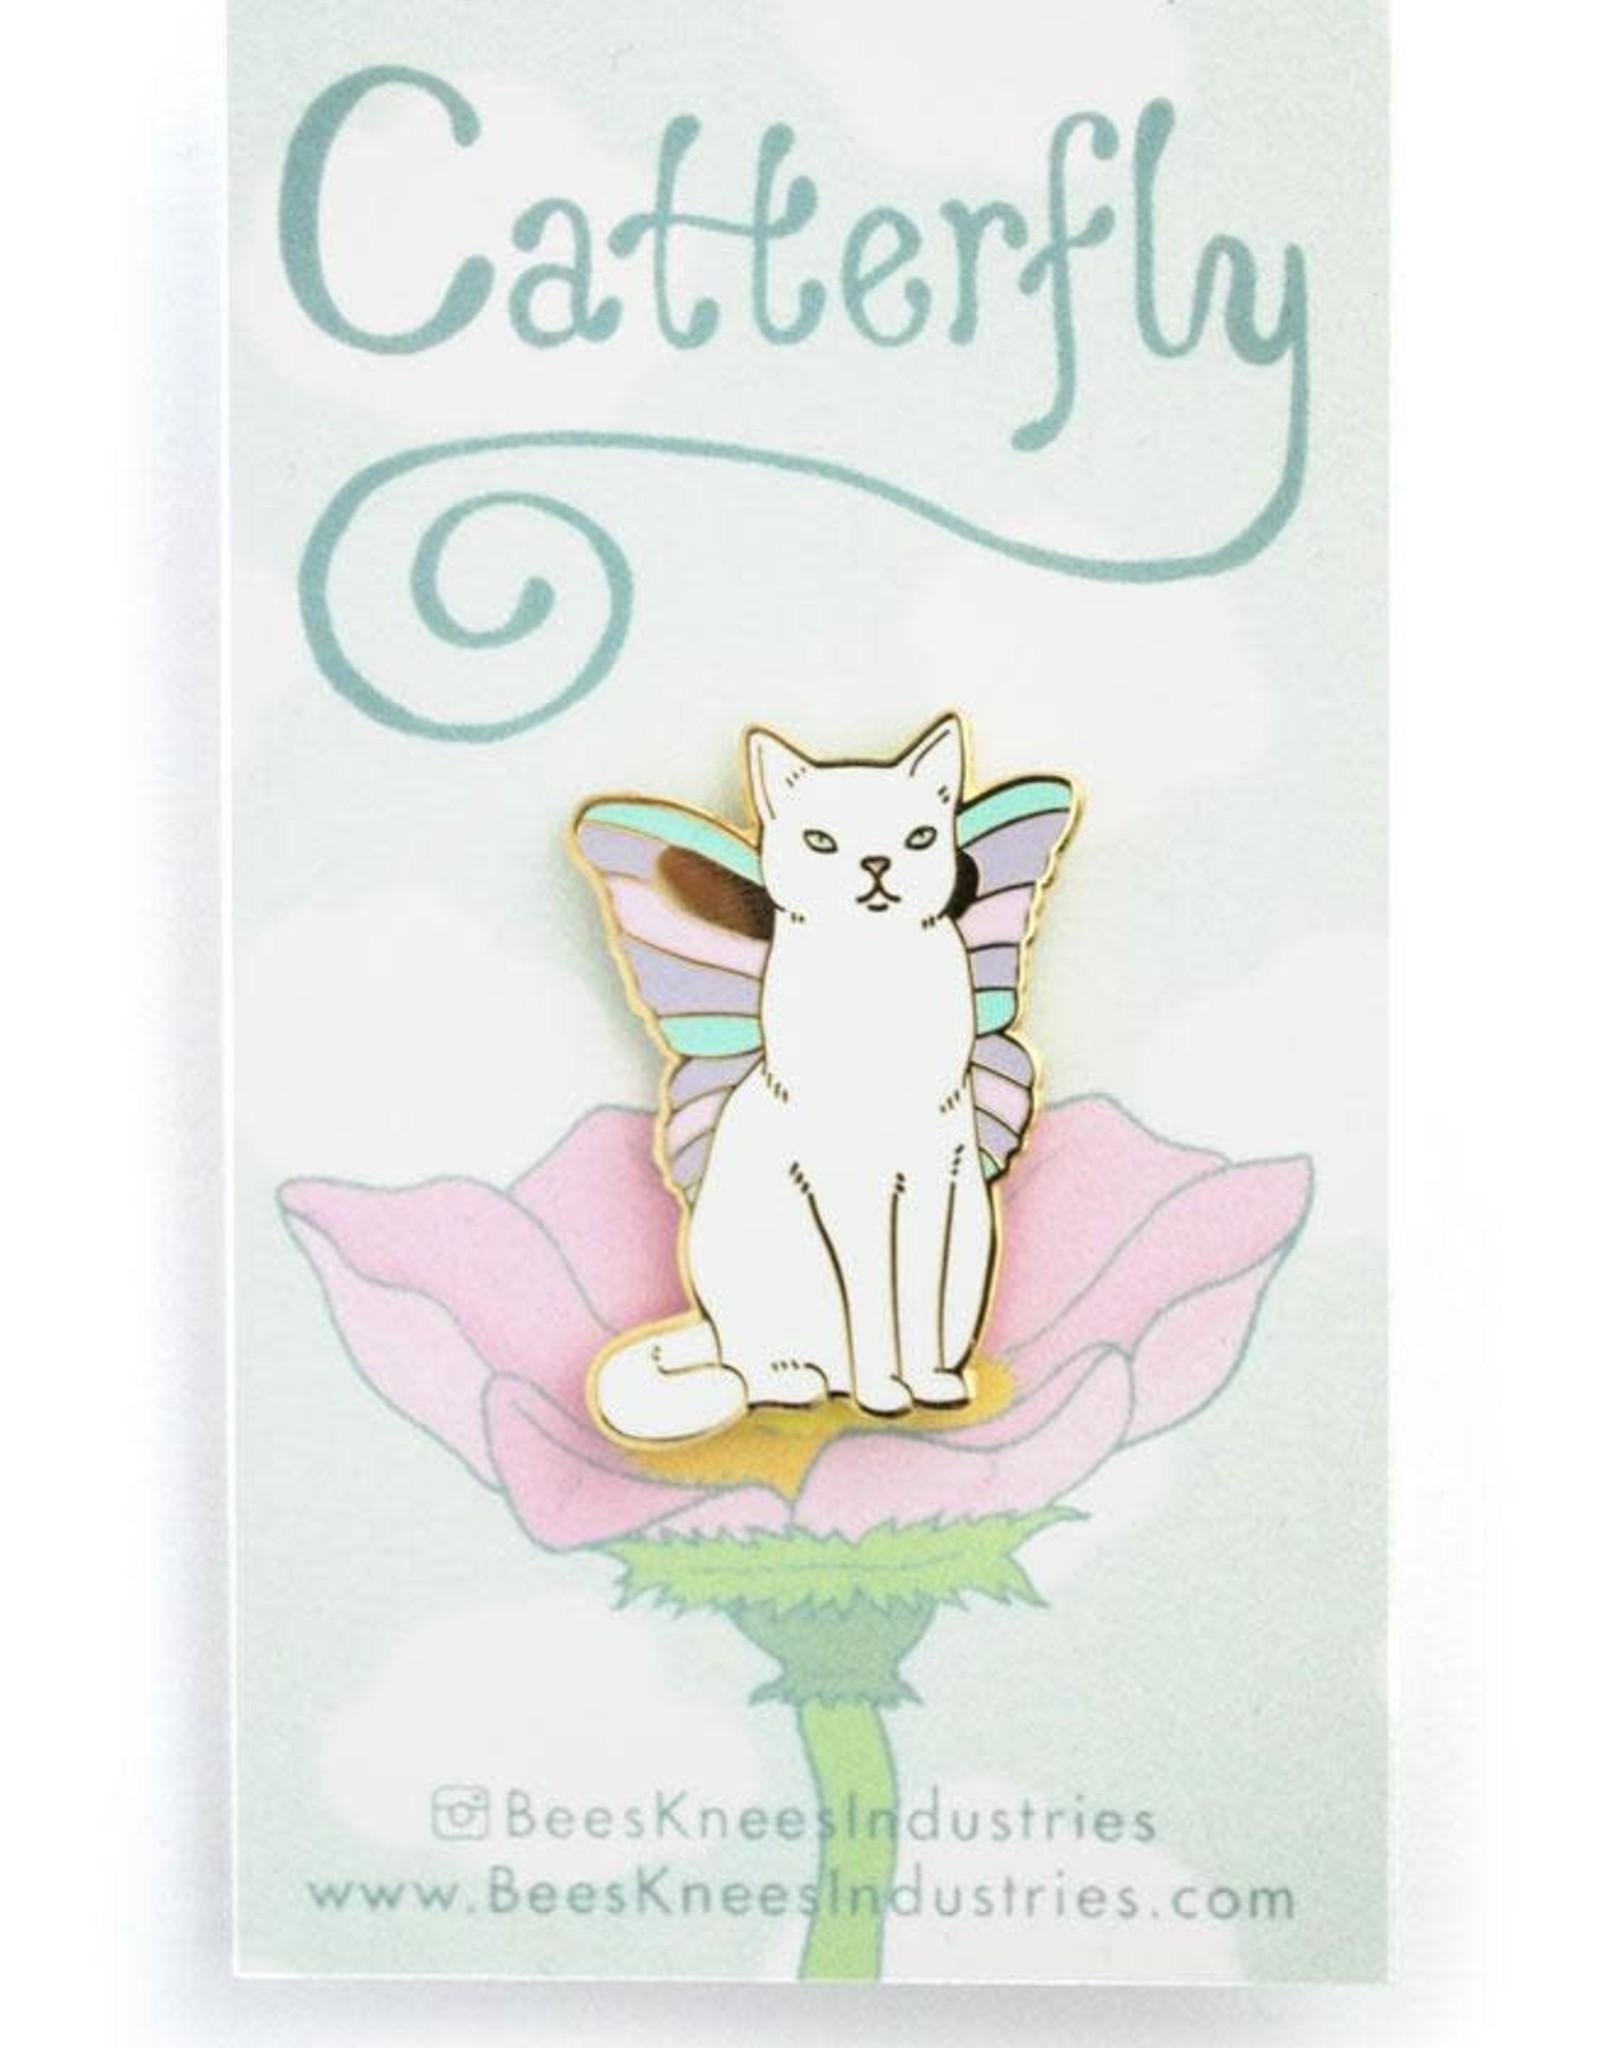 Bee's Knees Industries ''Catterfly'' Butterfly cat Enamel Pin - Bee's Knees